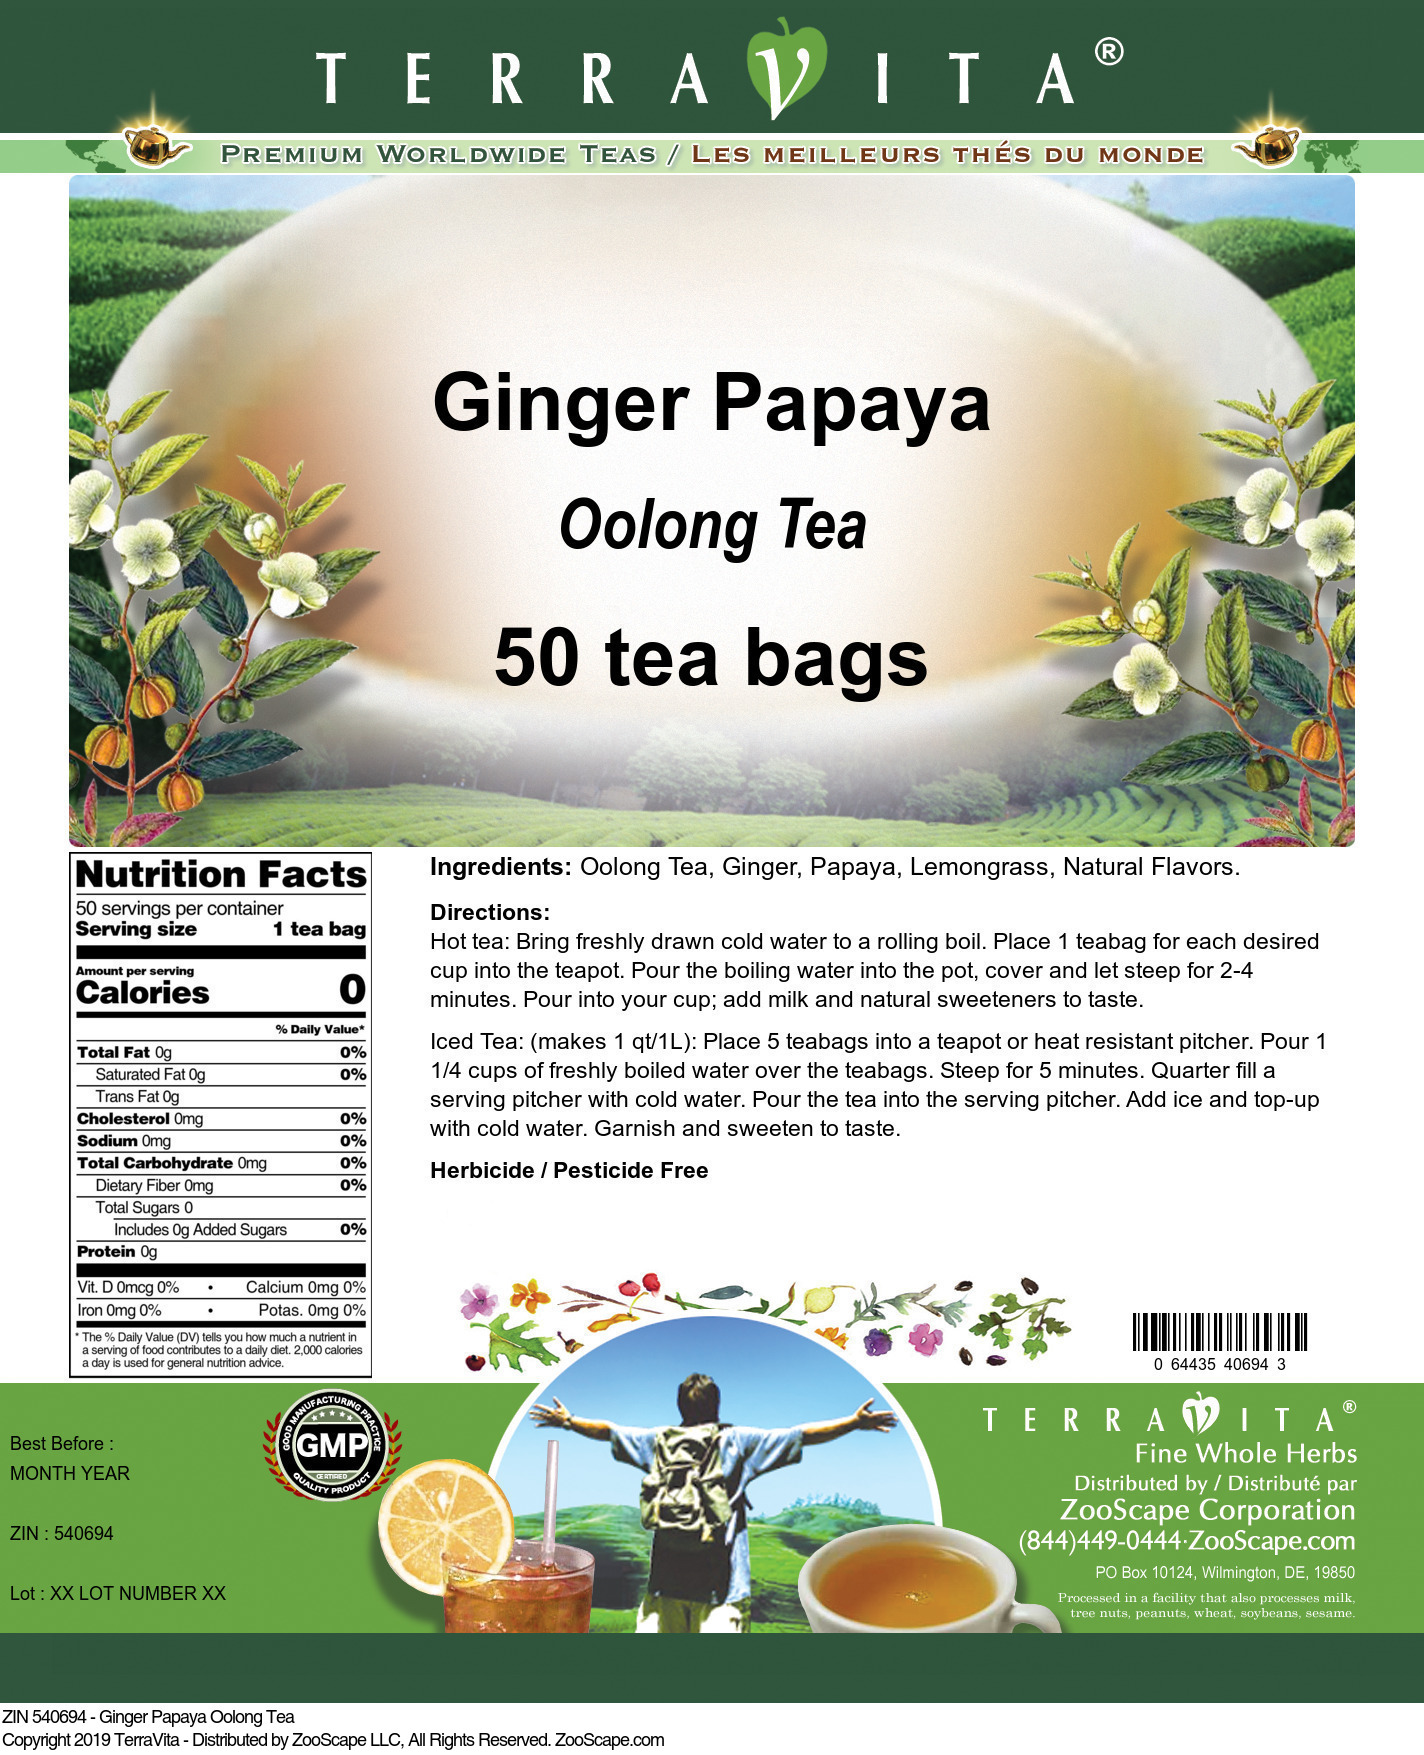 Ginger Papaya Oolong Tea